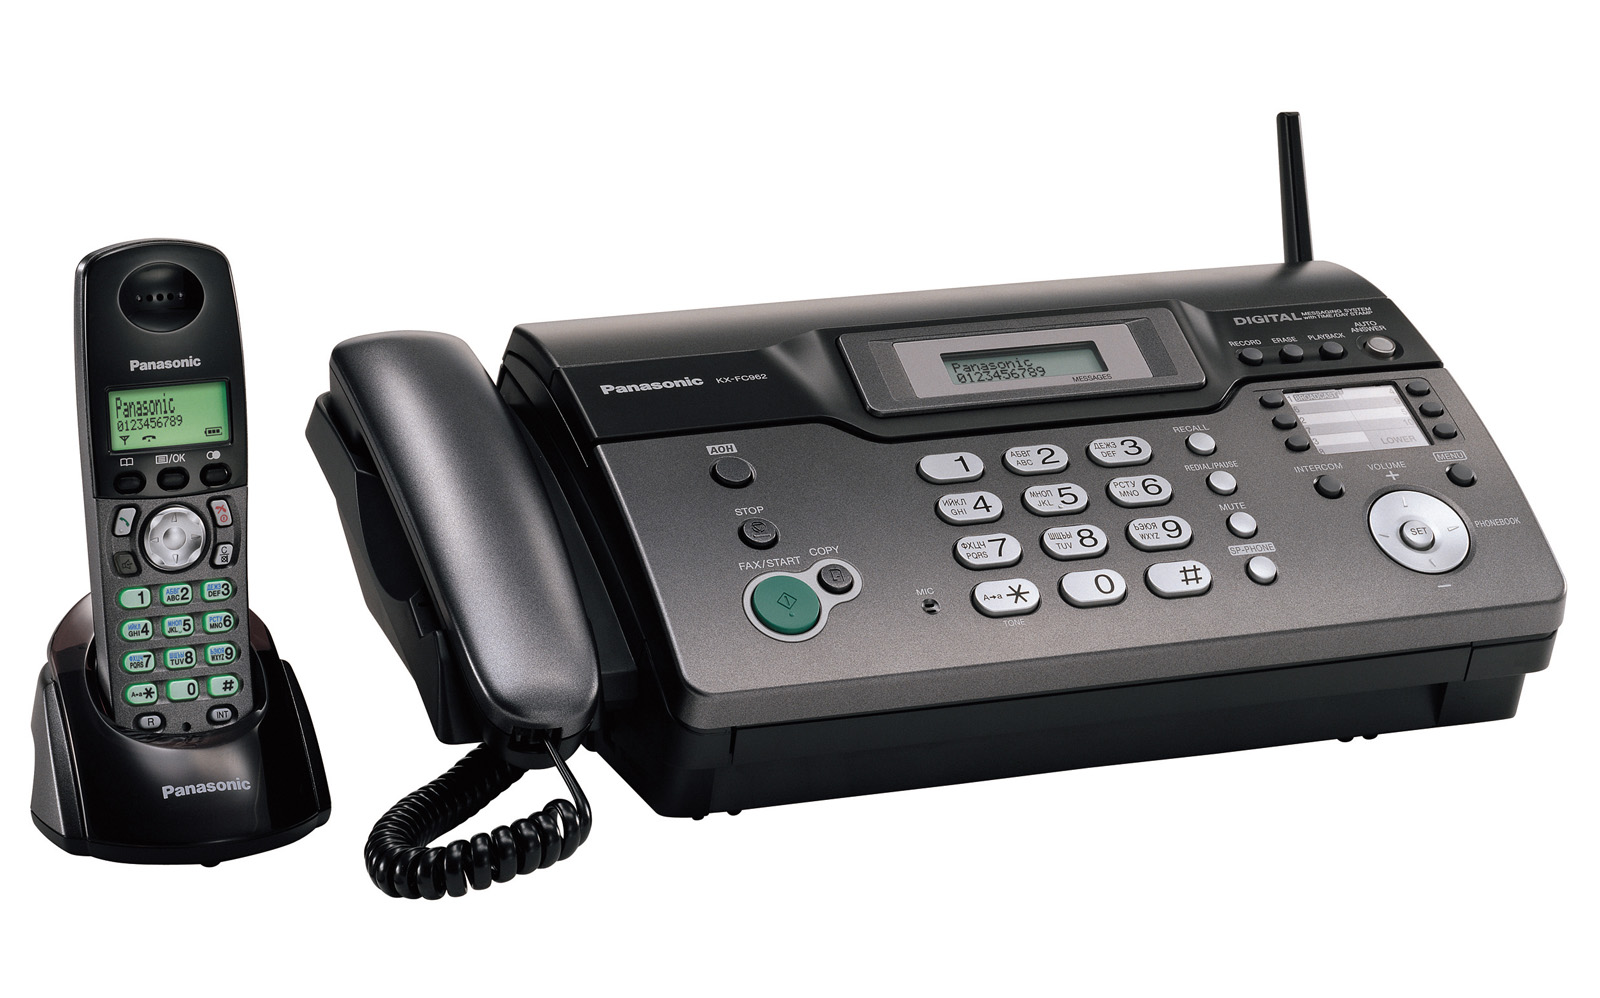 Panasonic факс kx fc962 инструкция